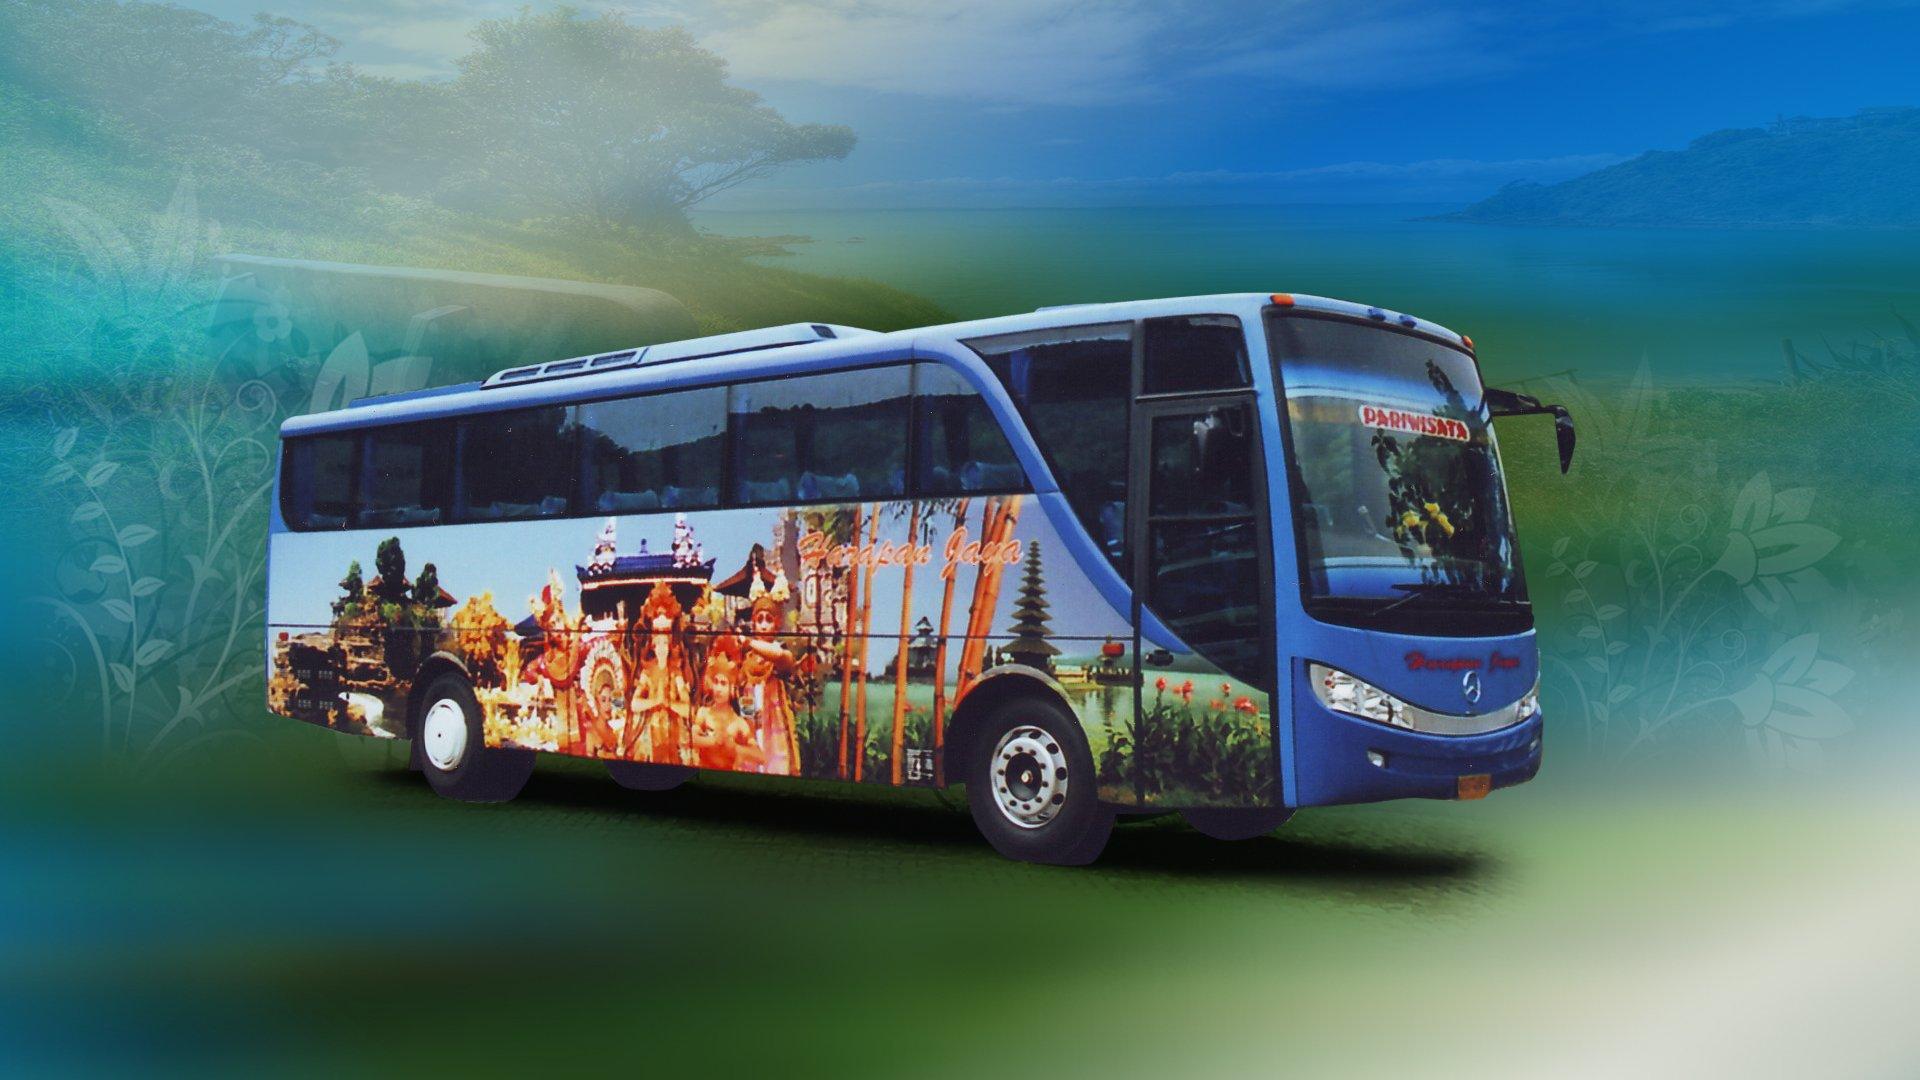 Bus Wallpaper Bus Malam Patas Bus Pariwisata 1920x1080